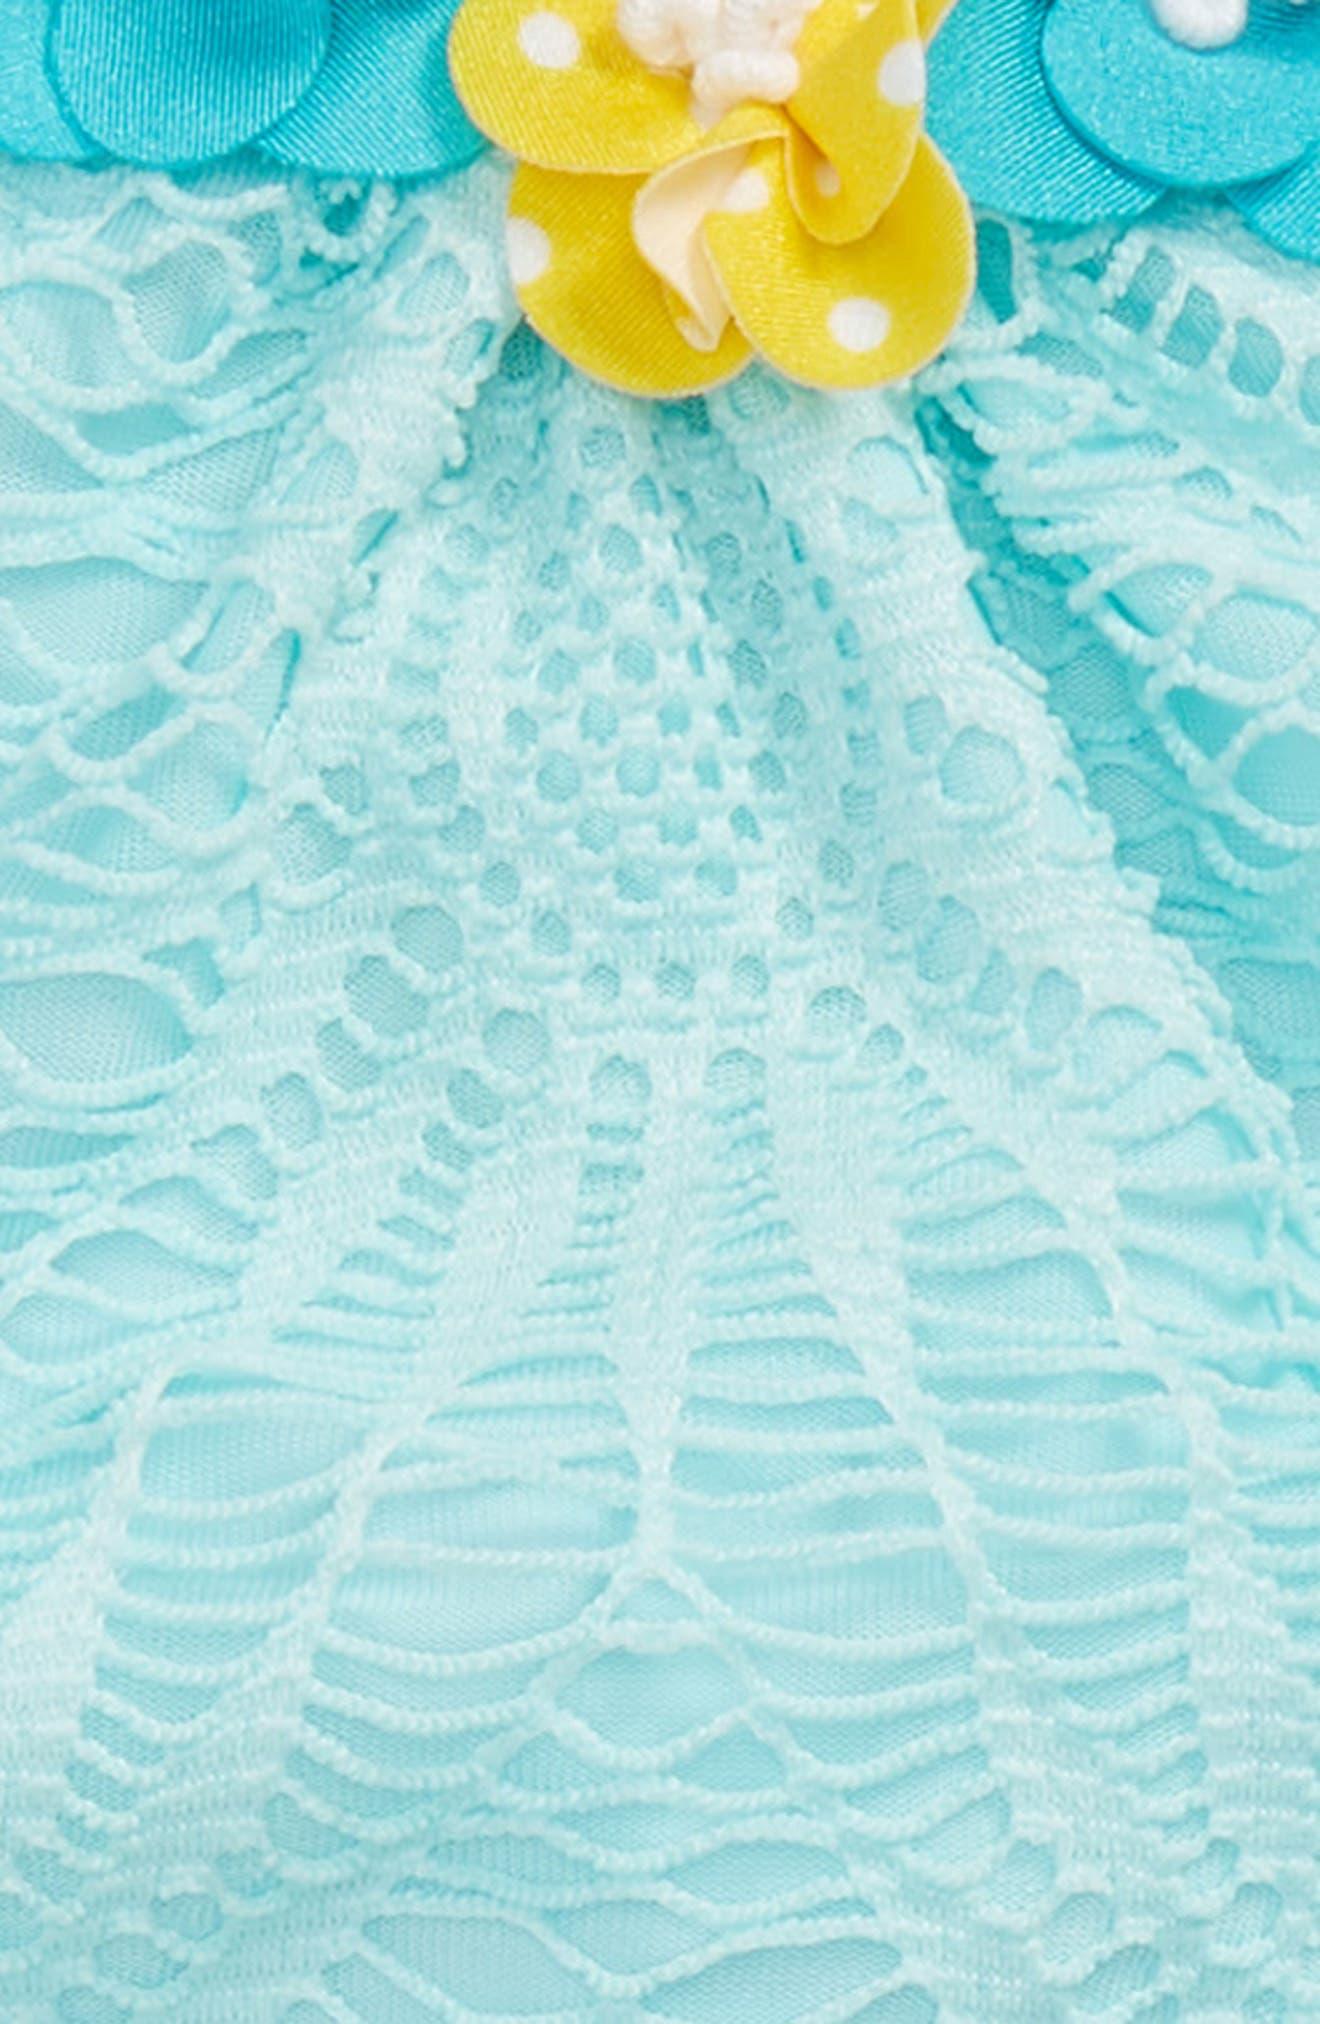 Hula Two-Piece Bikini Swimsuit,                             Alternate thumbnail 2, color,                             400